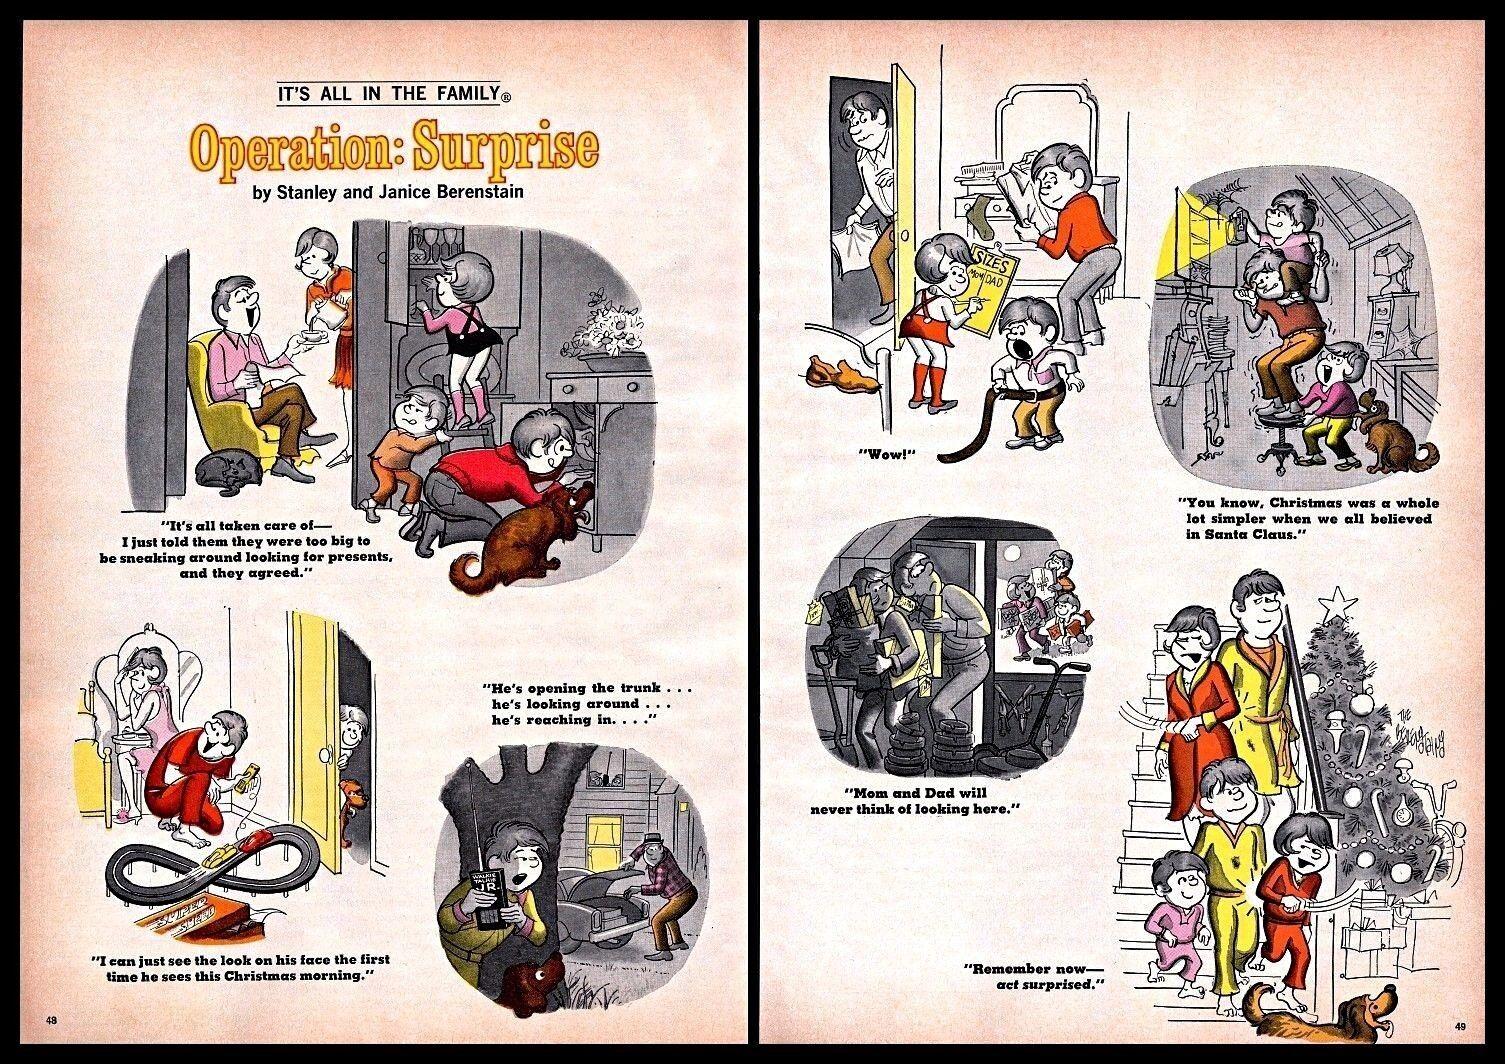 1973 Operation Surprise Christmas Family Comics Drawing Vintage Print Art 1970s Ebay